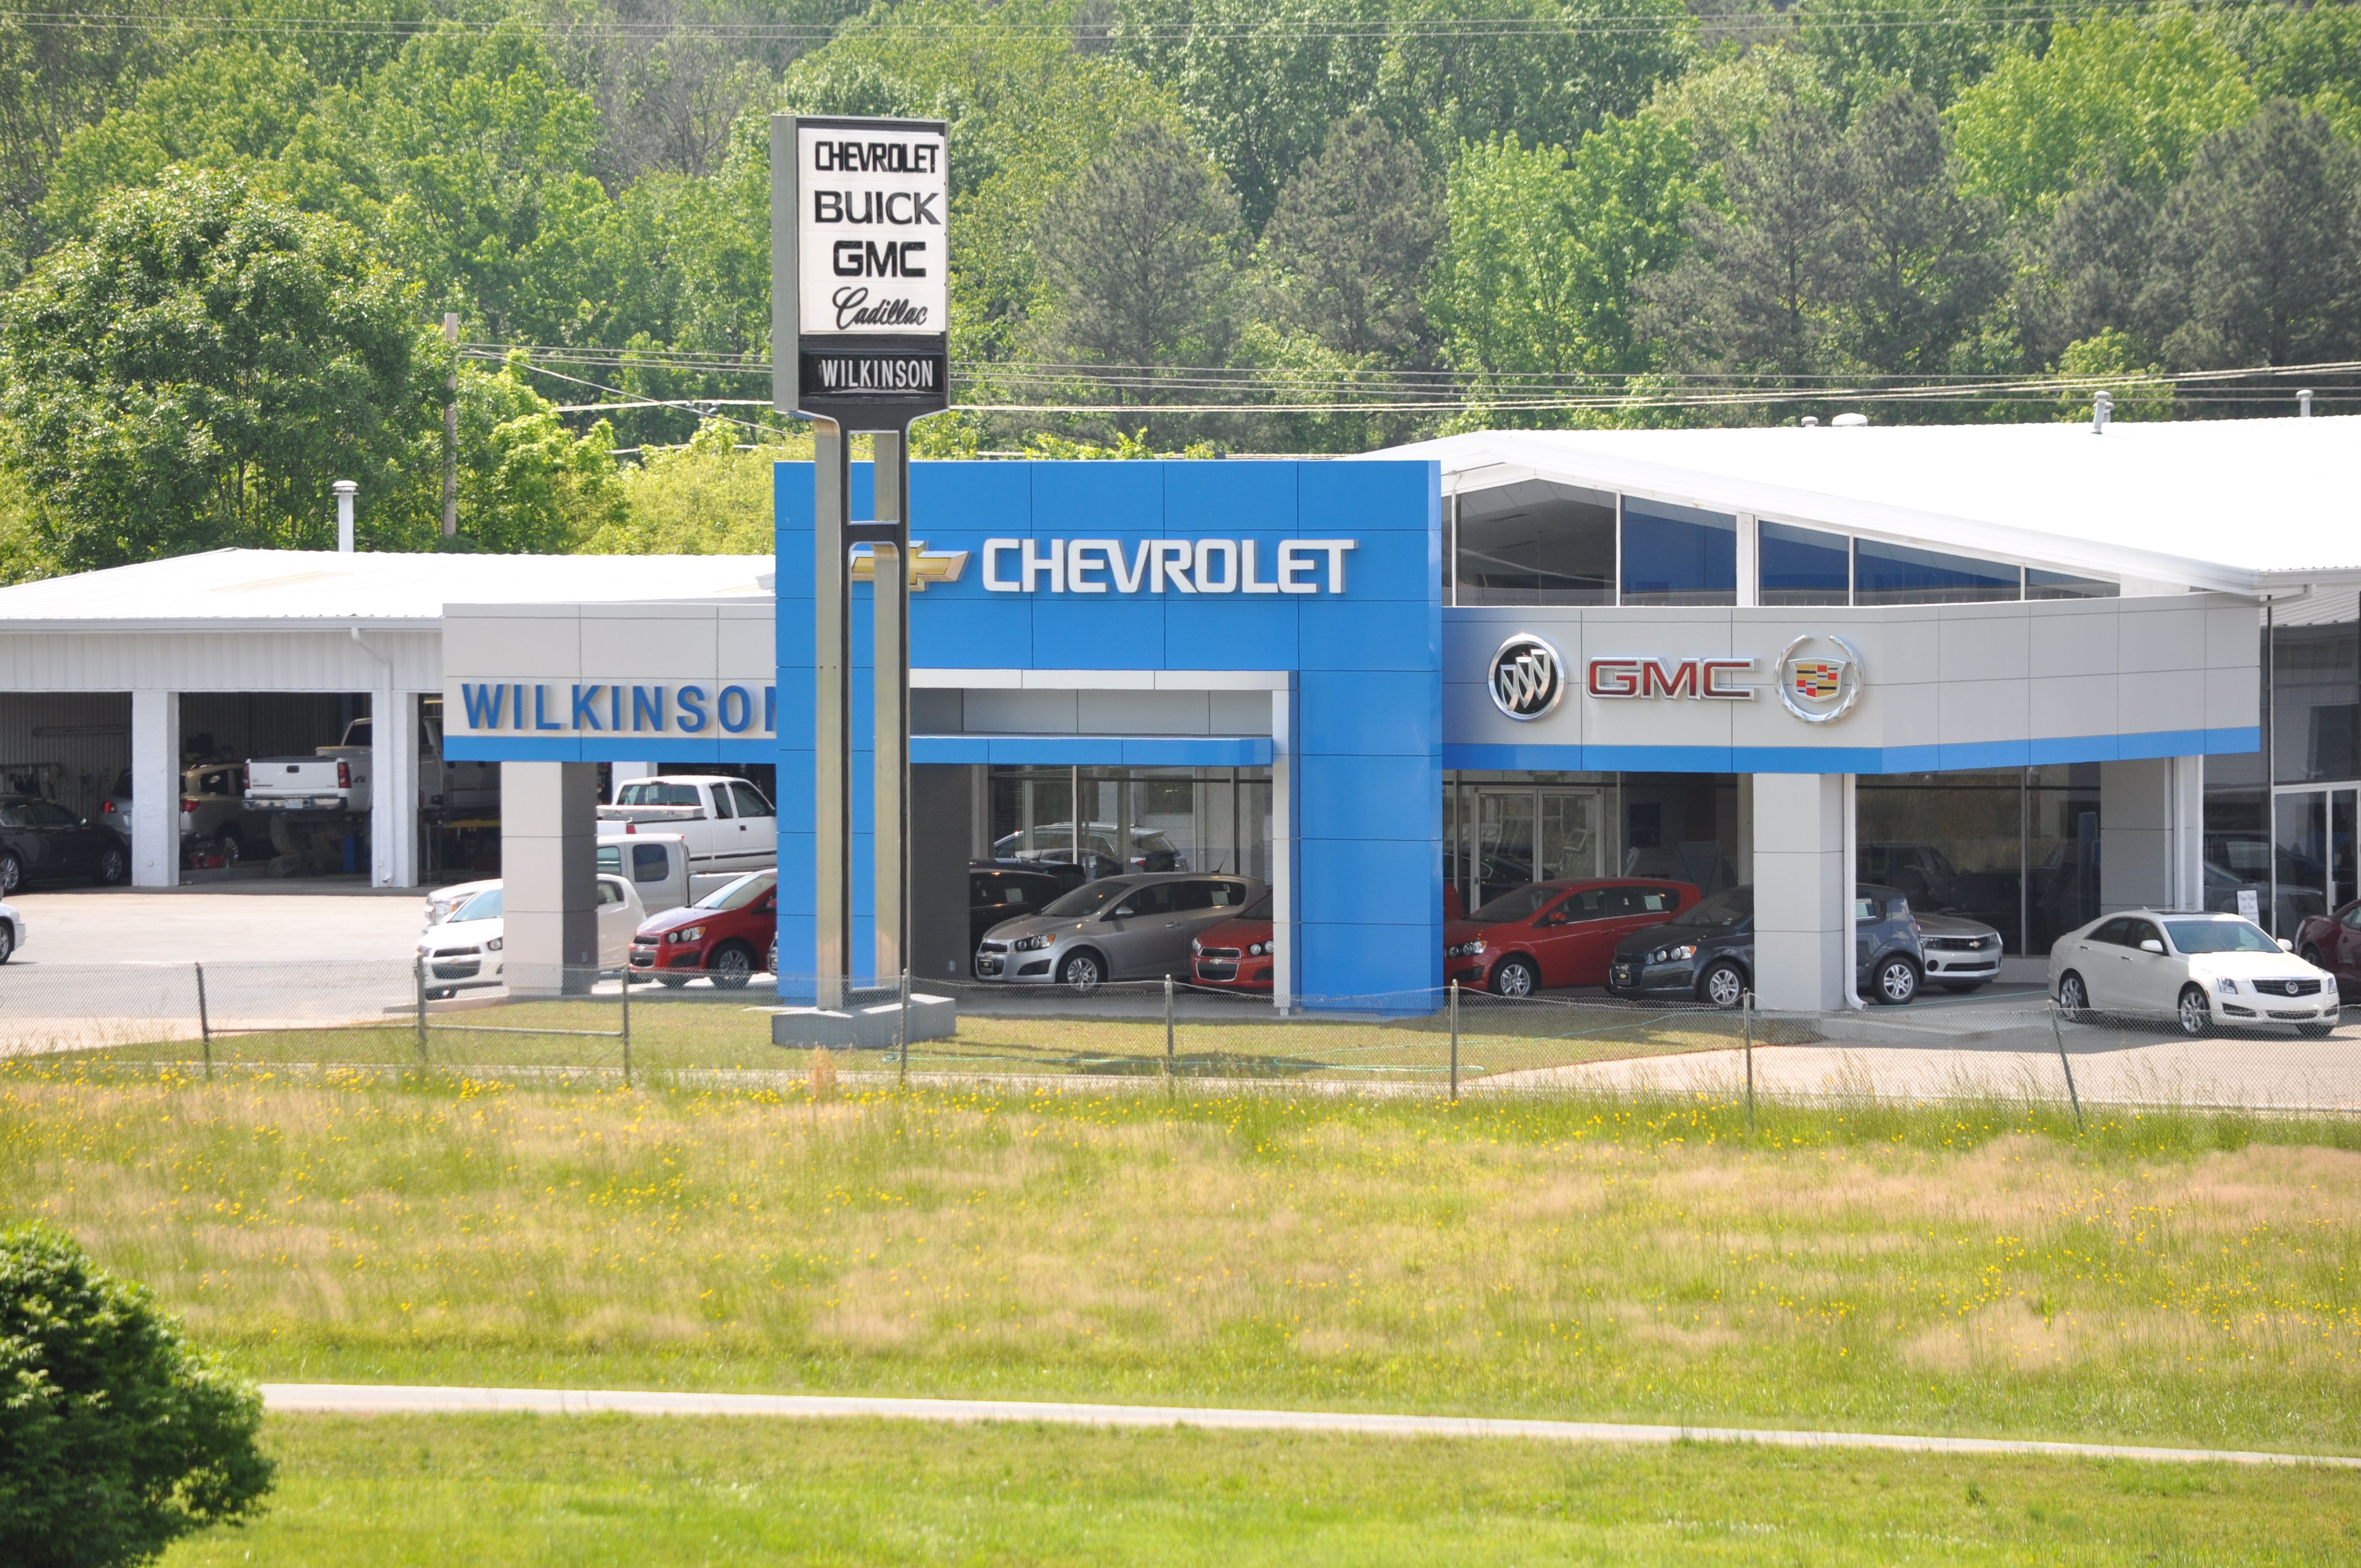 Wilkinson Chevrolet Remodel In Sanford North Carolina Designed By Plageman Architecture North Carolina Car Dealership Buick Gmc Chevrolet